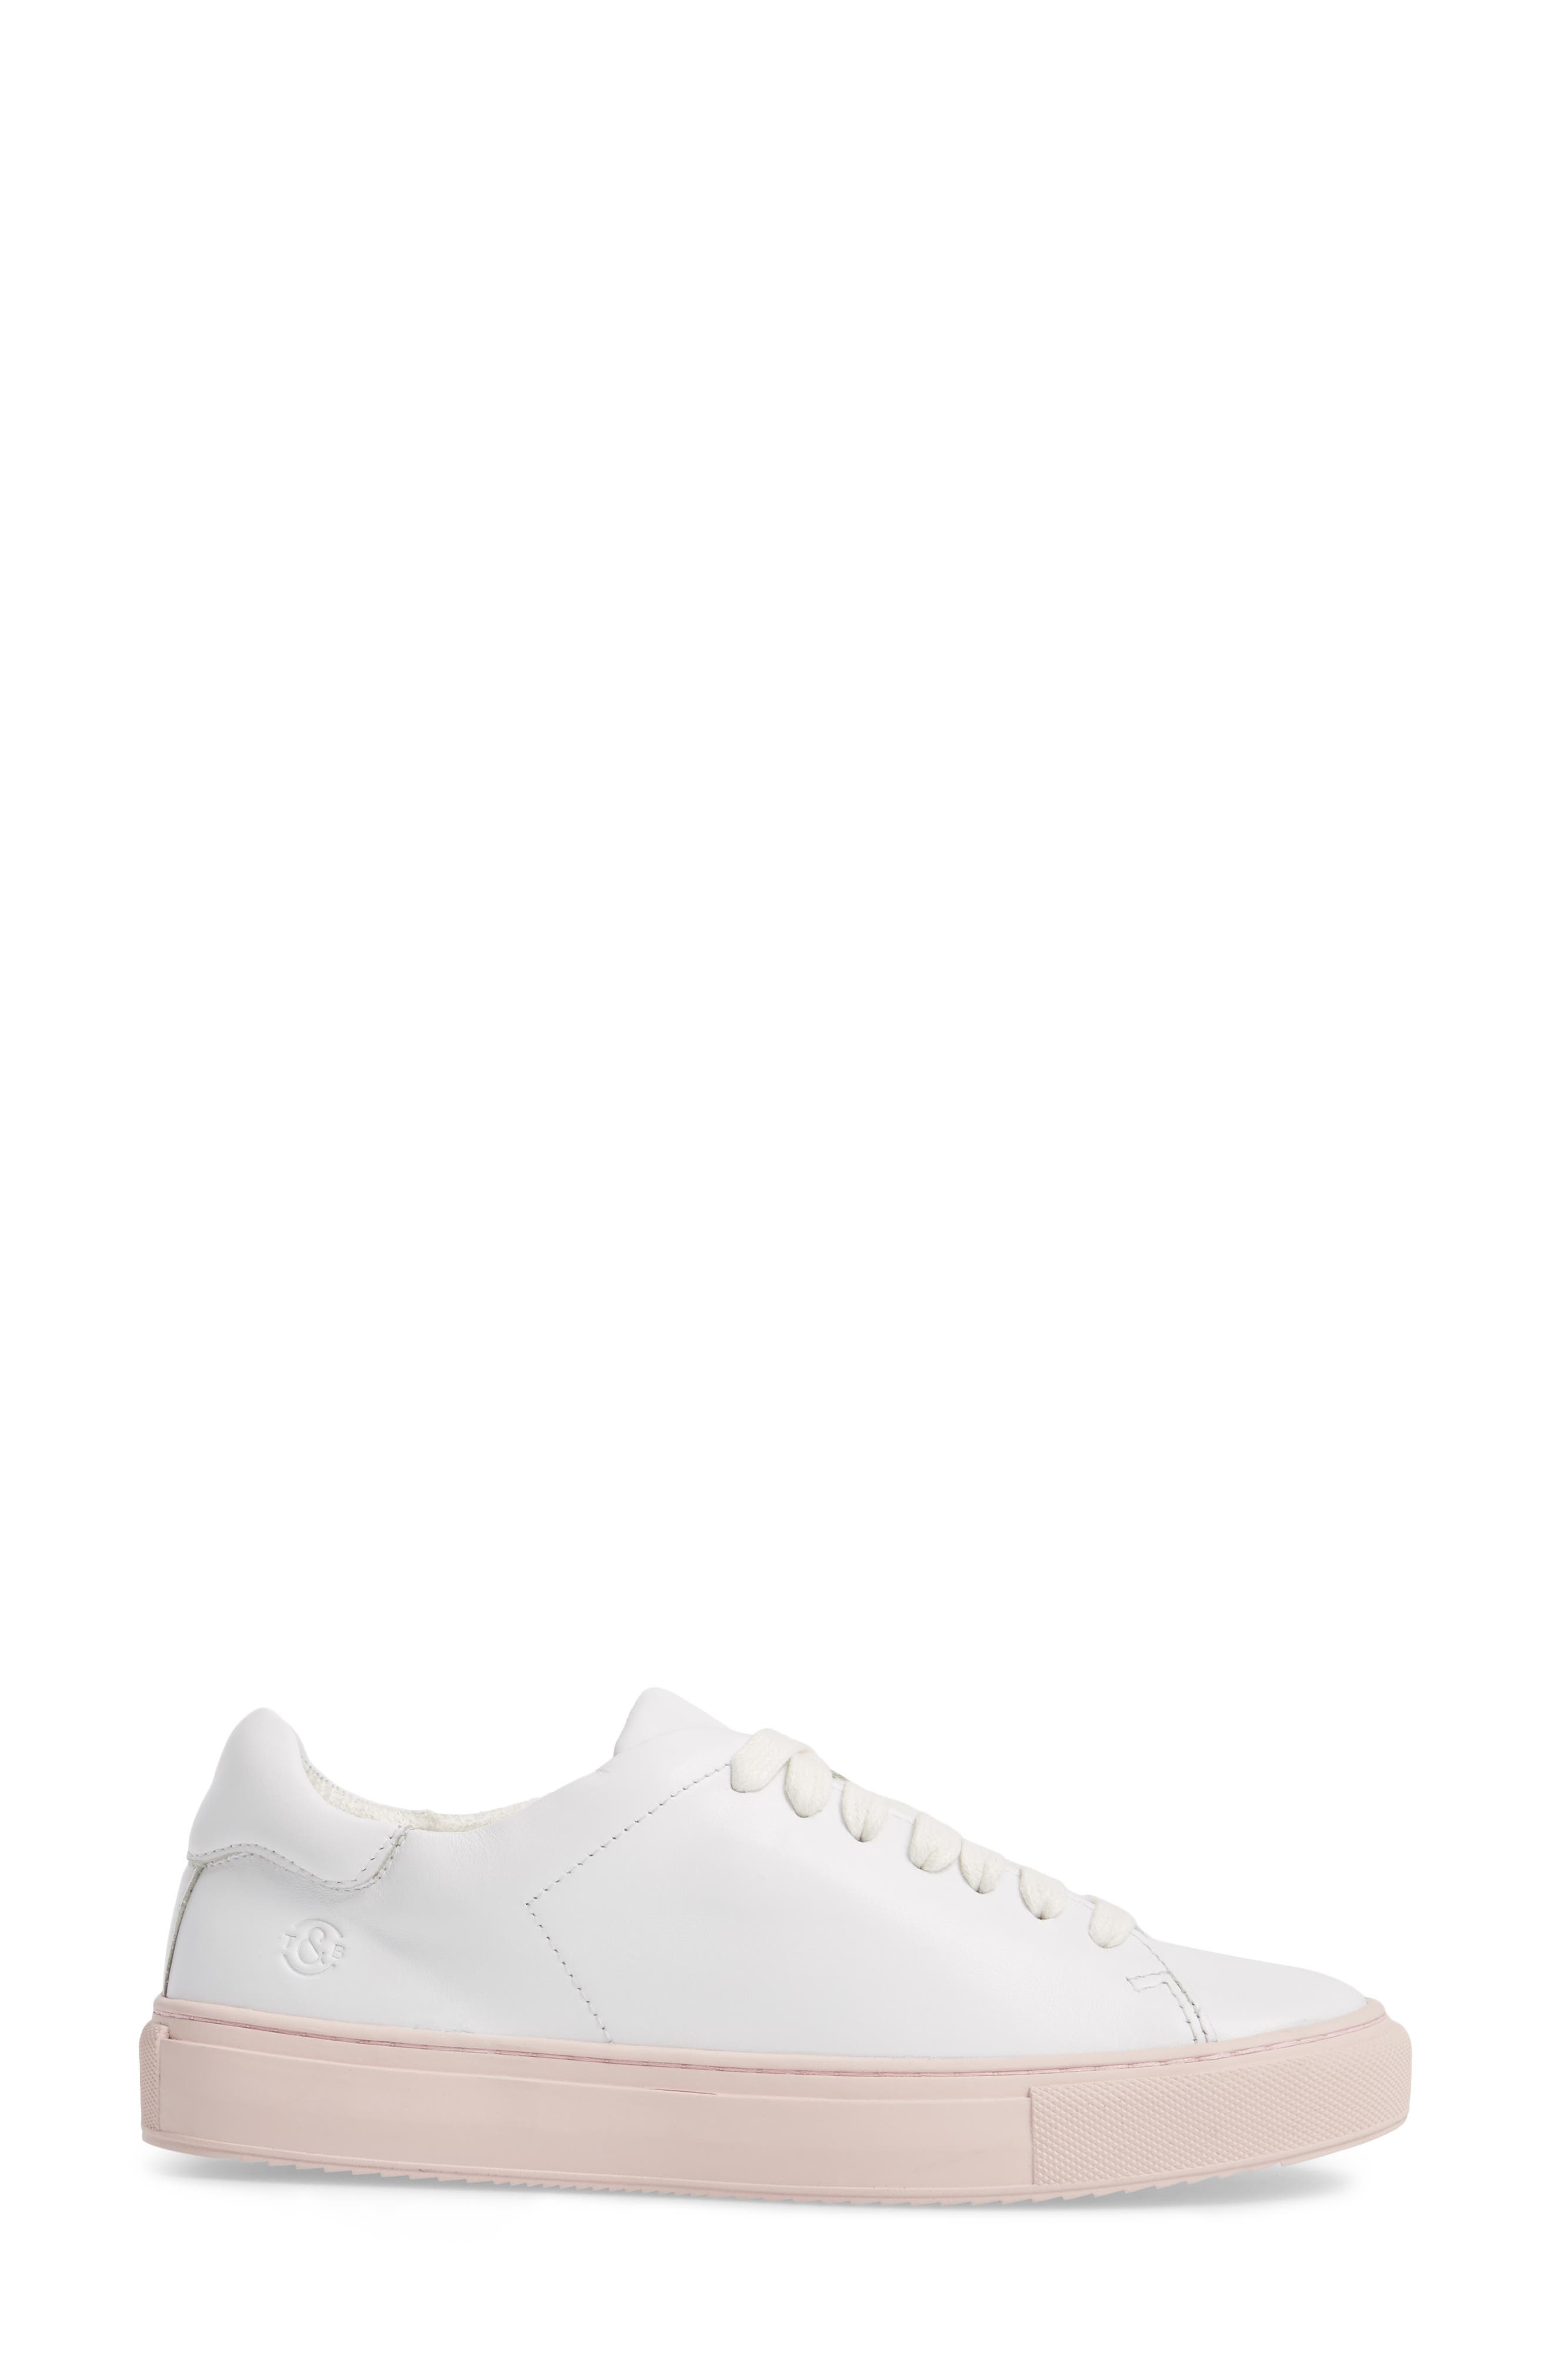 Cassidy Sneaker,                             Alternate thumbnail 3, color,                             100